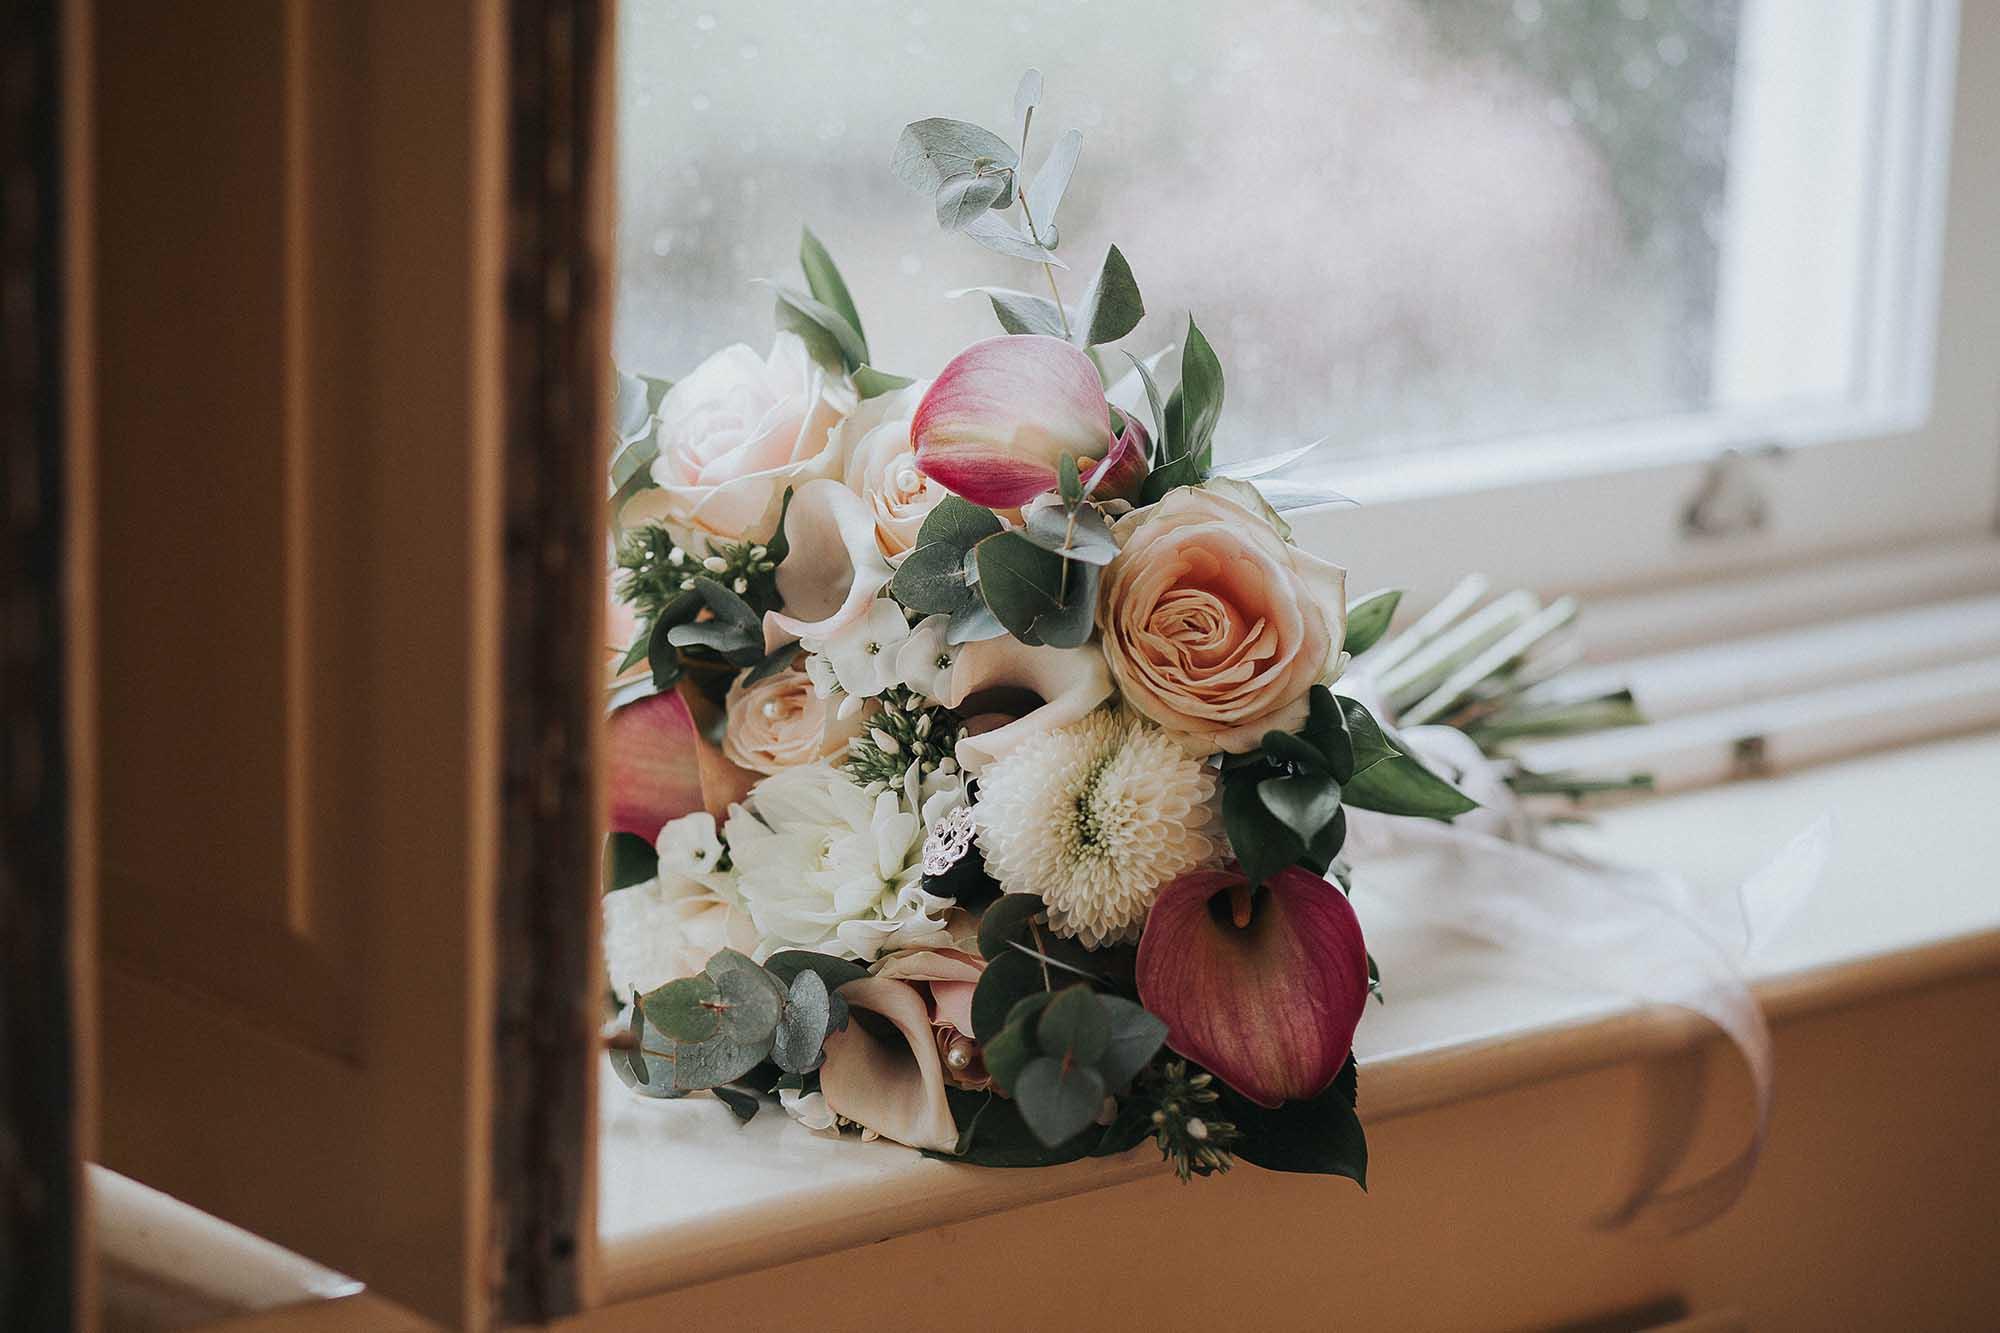 Buddies Florist wedding